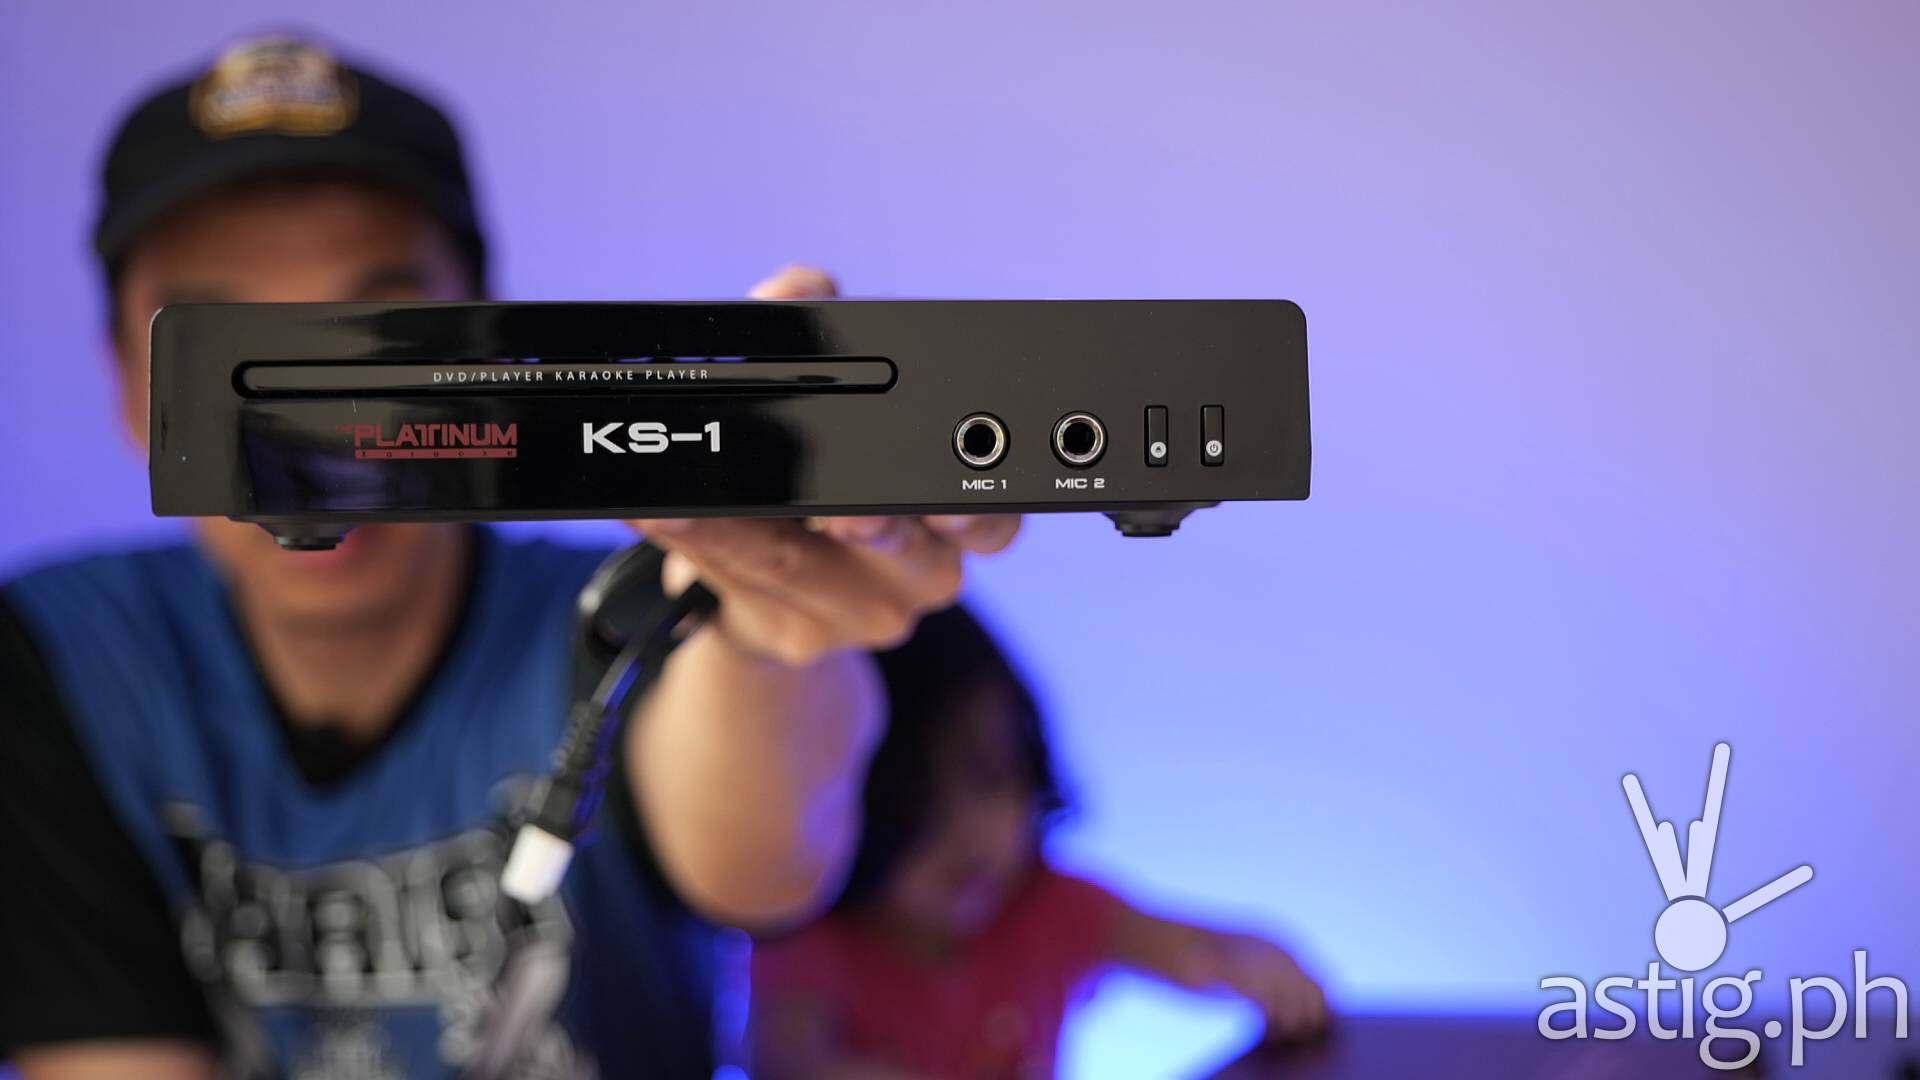 Main player - Platinum Karaoke KS-1 home karaoke videoke system